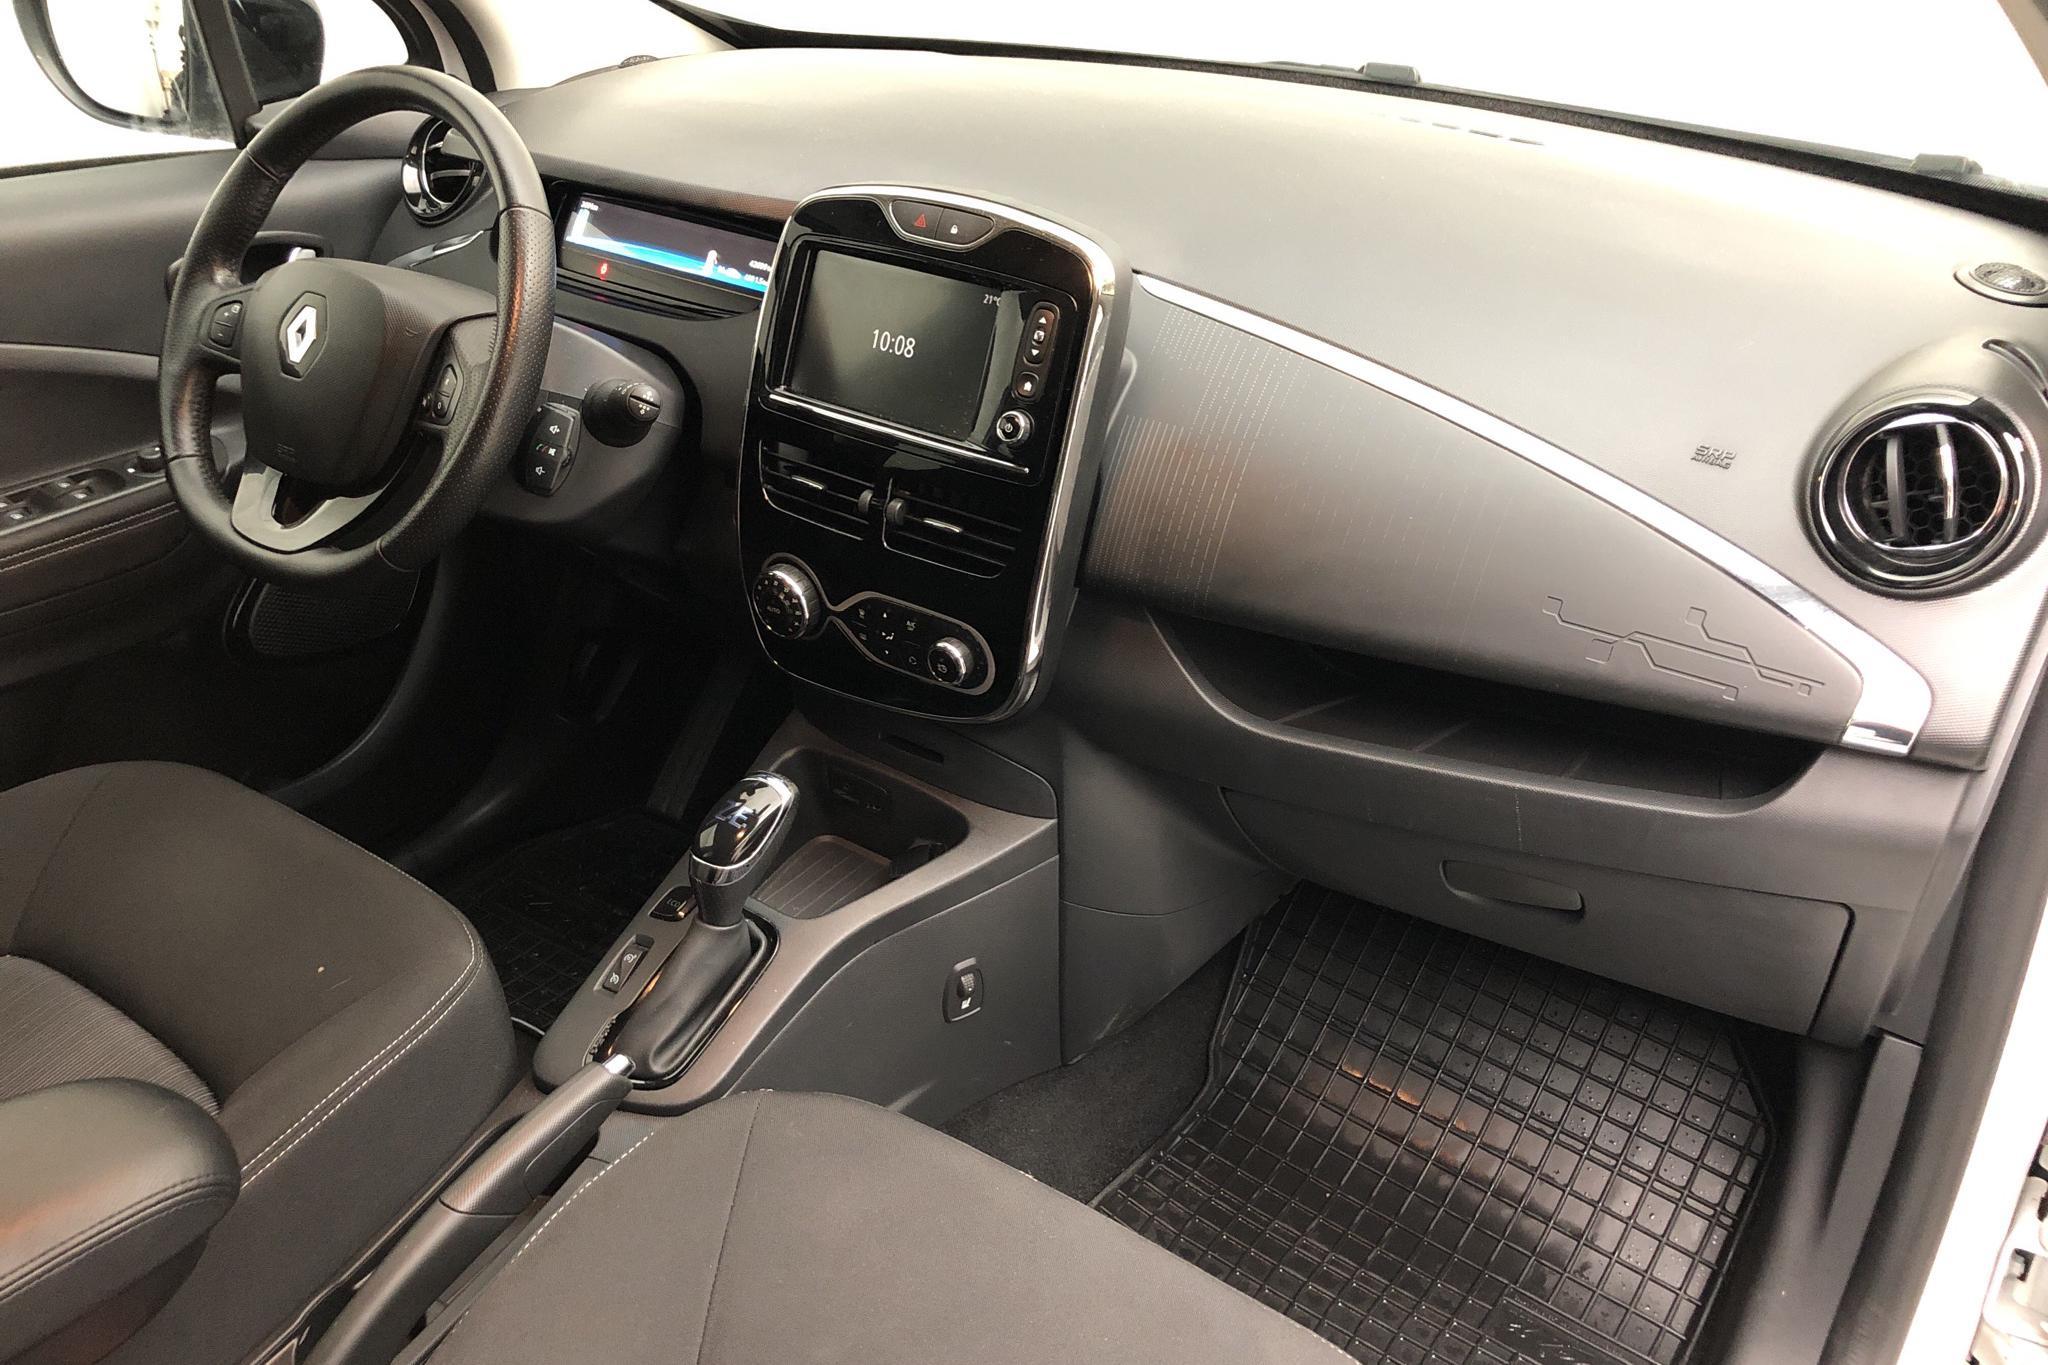 Renault Zoe 41 kWh R110 (108hk) - 4 261 mil - Automat - vit - 2018